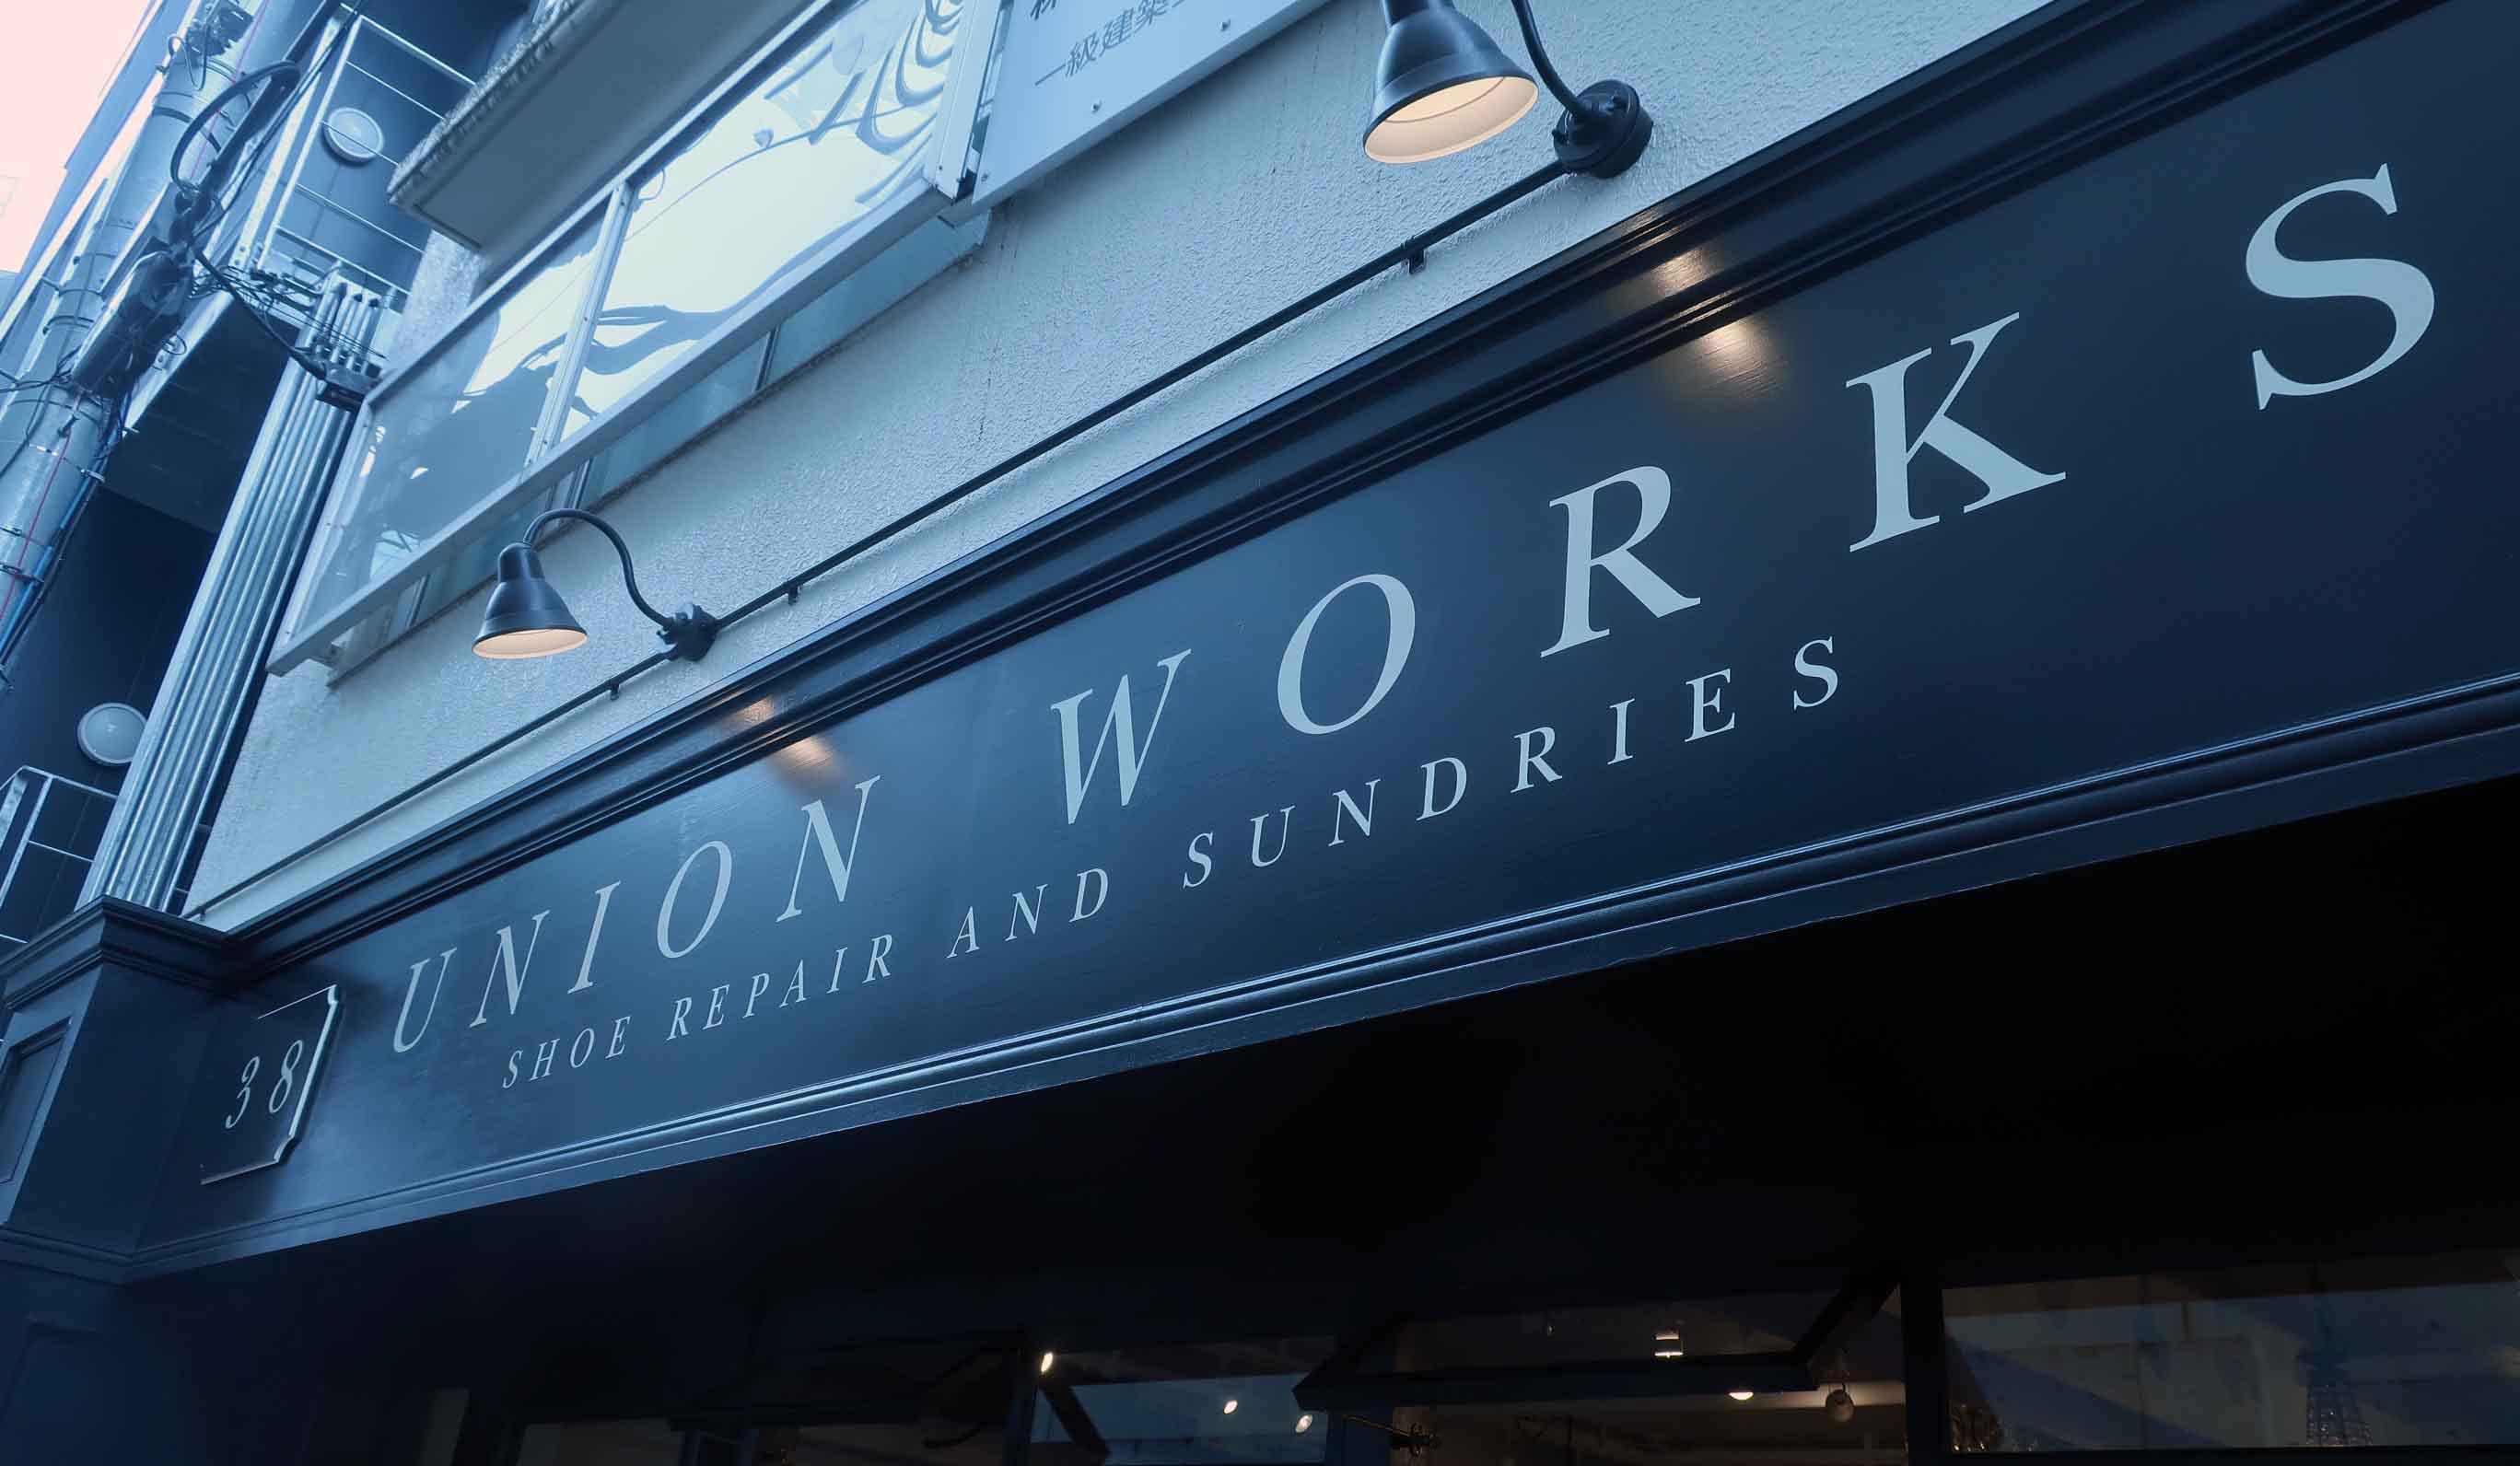 『UNION WORKS』青山店